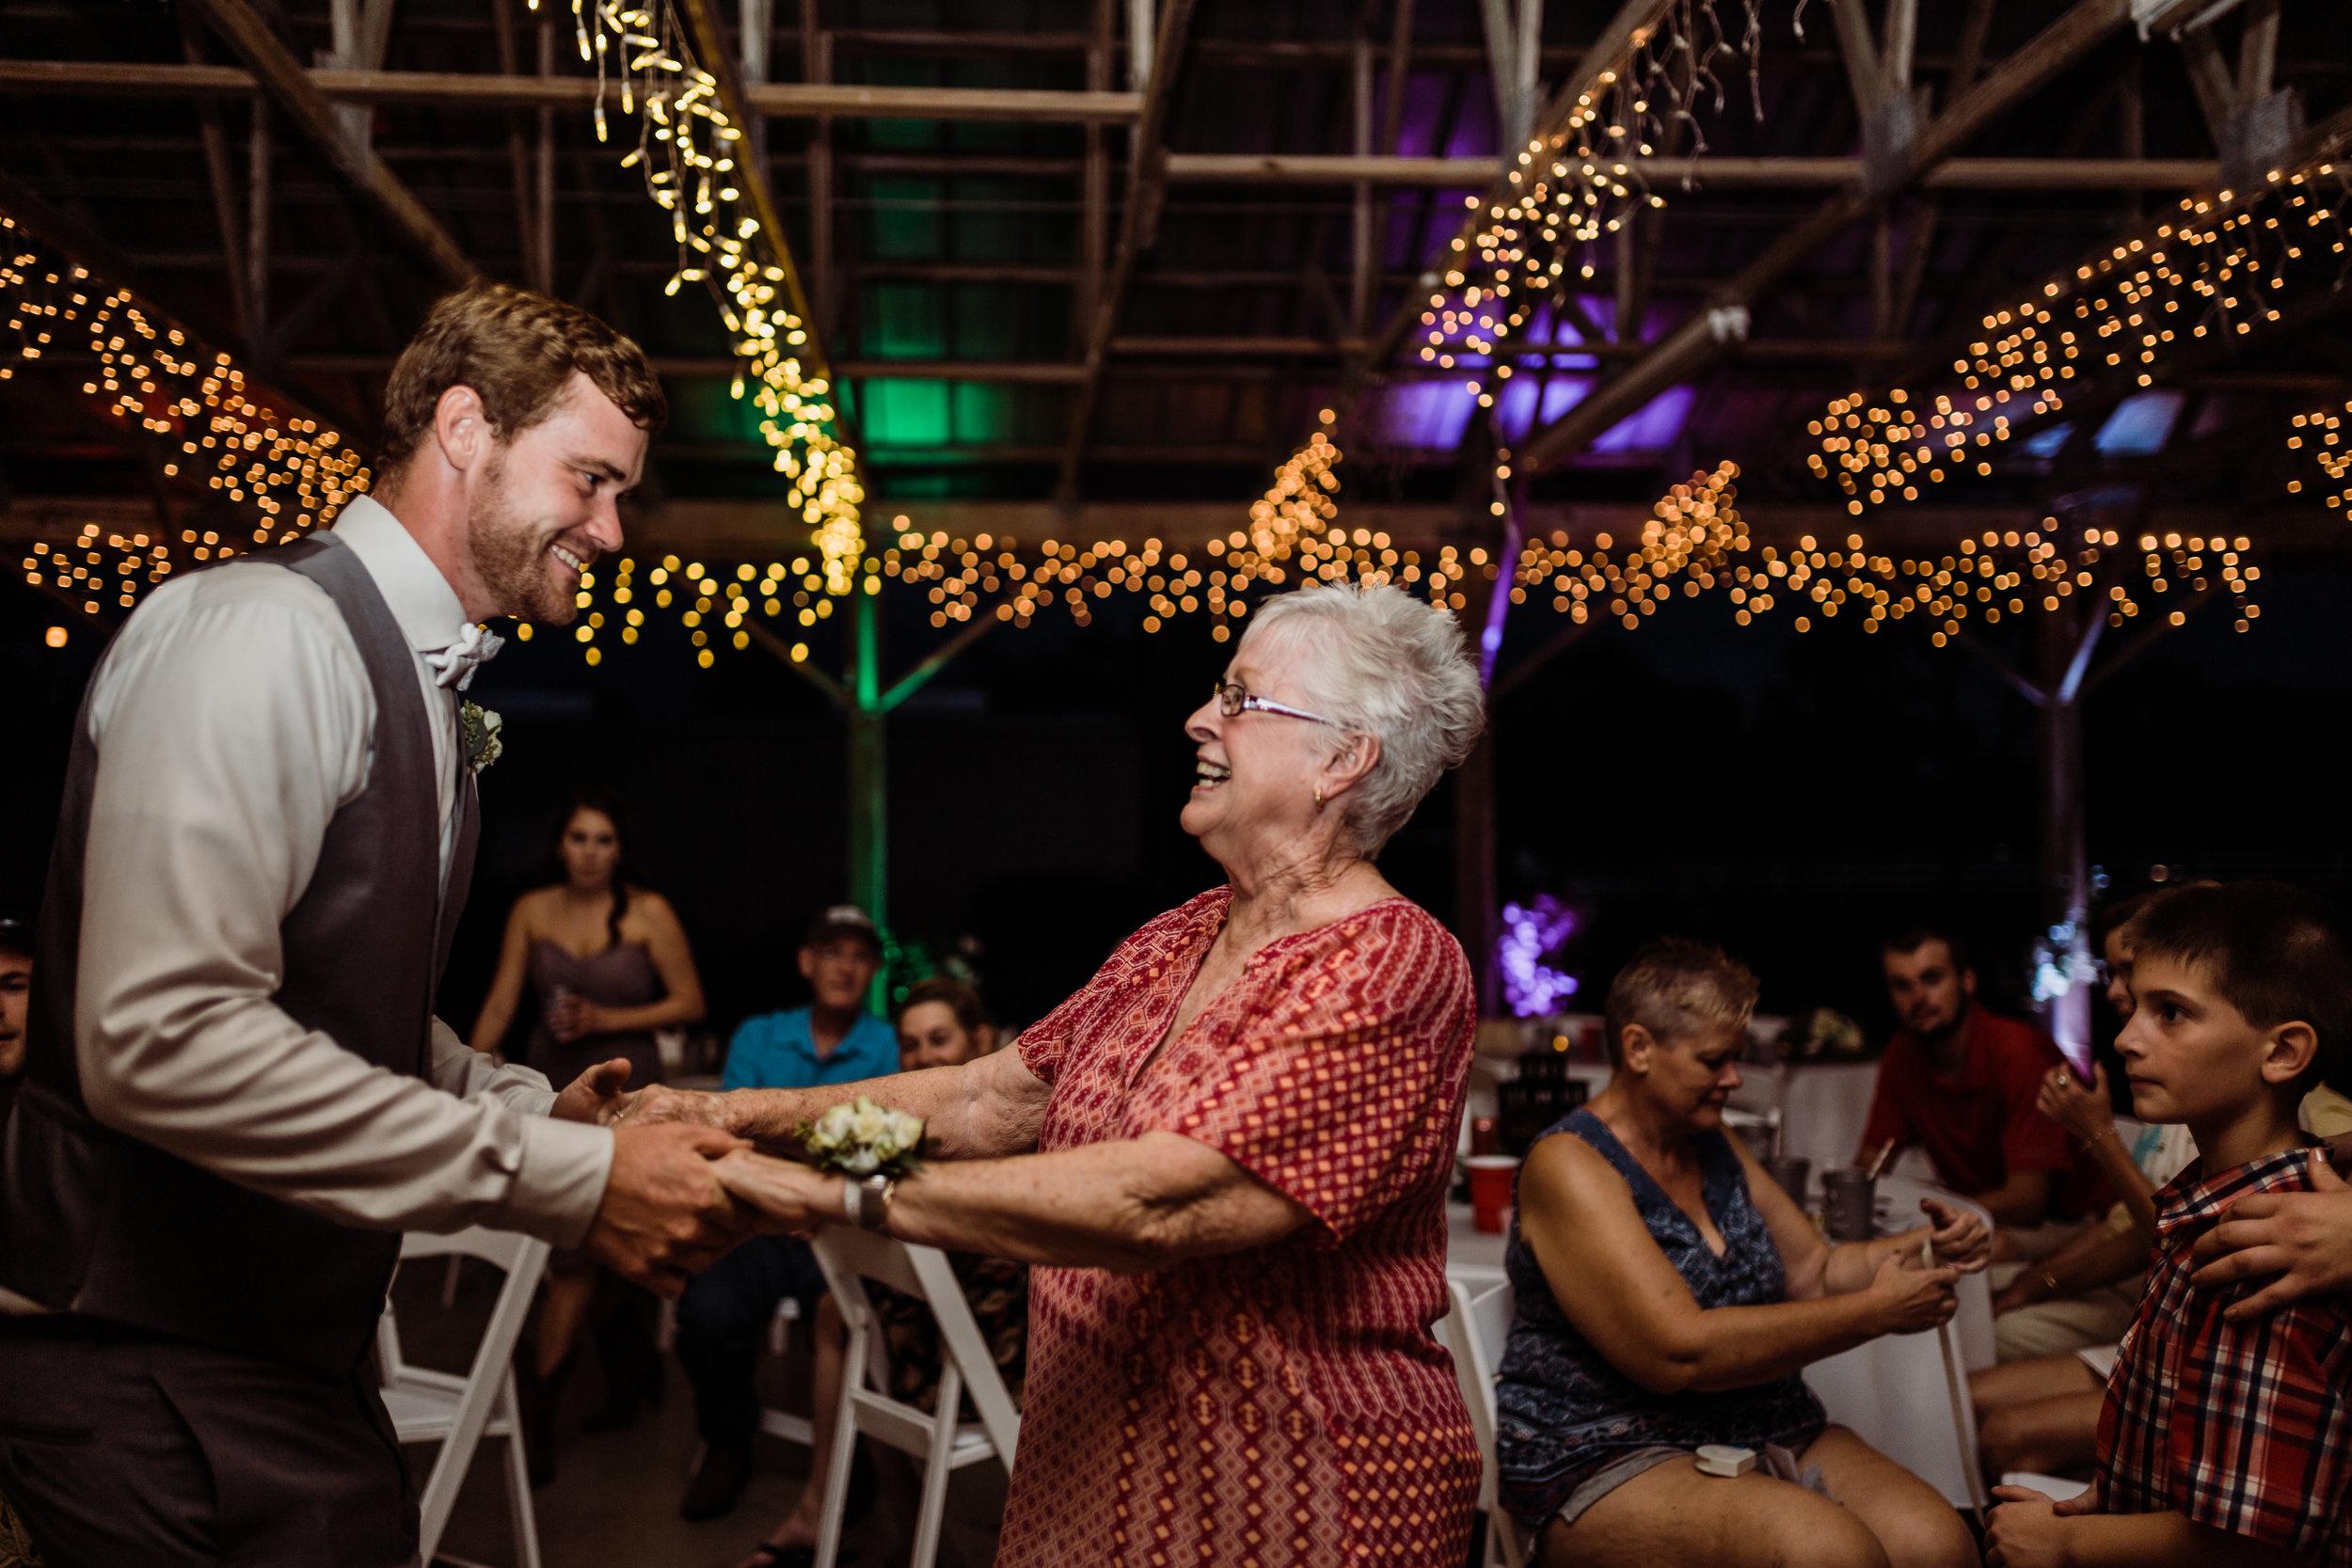 2017.10.14 Samantha and Matthew Crabtree Sarasota Wedding (584 of 708).jpg